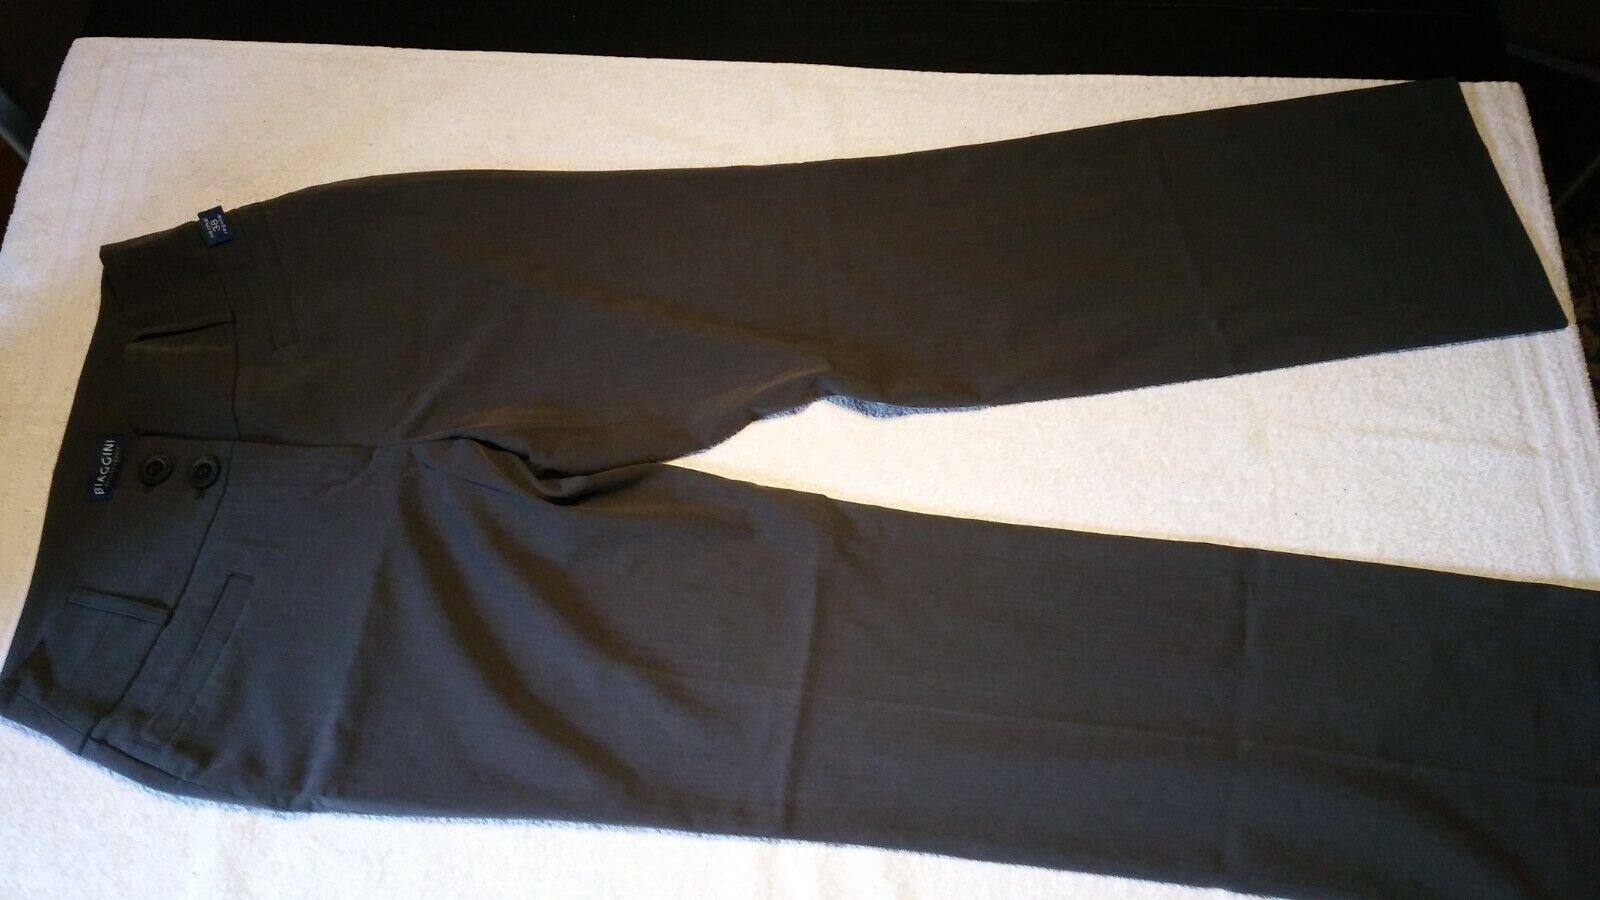 1 Damen Hose Gr. 38 (2434) von BIAGGINI grau